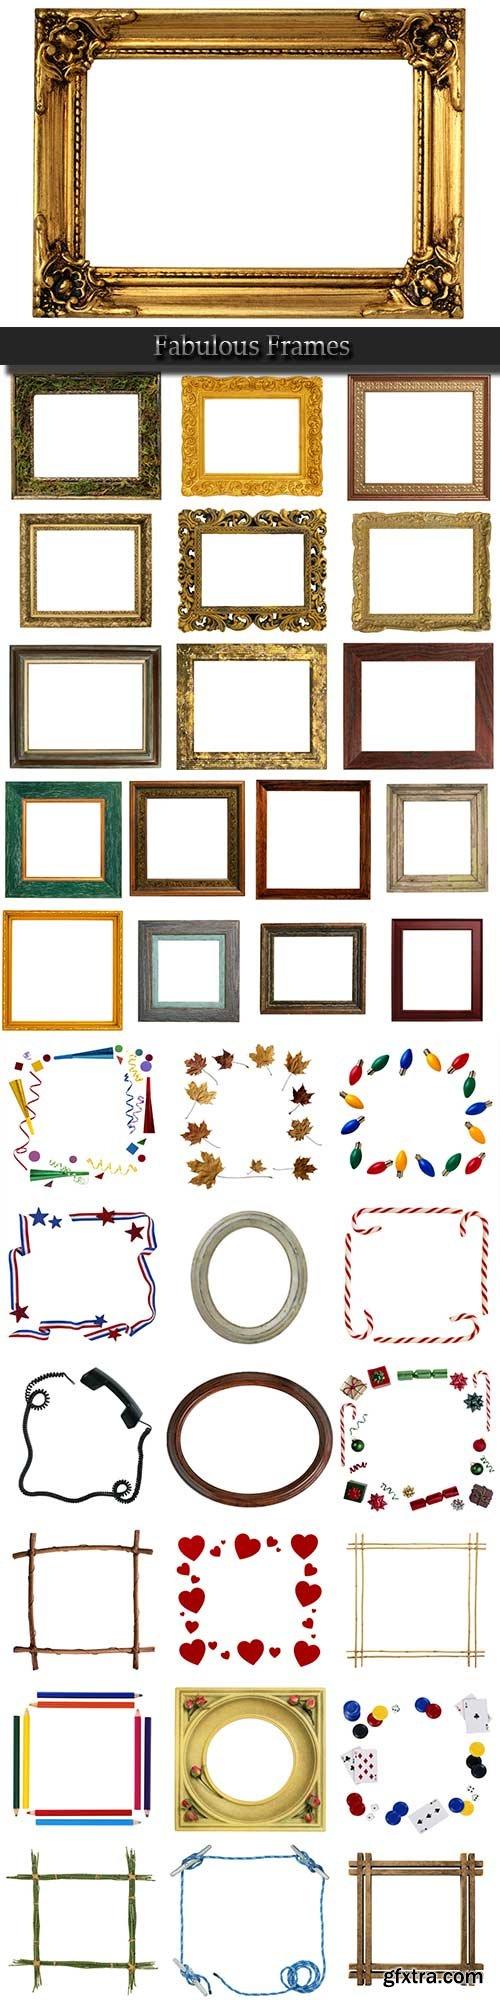 Fabulous Frames